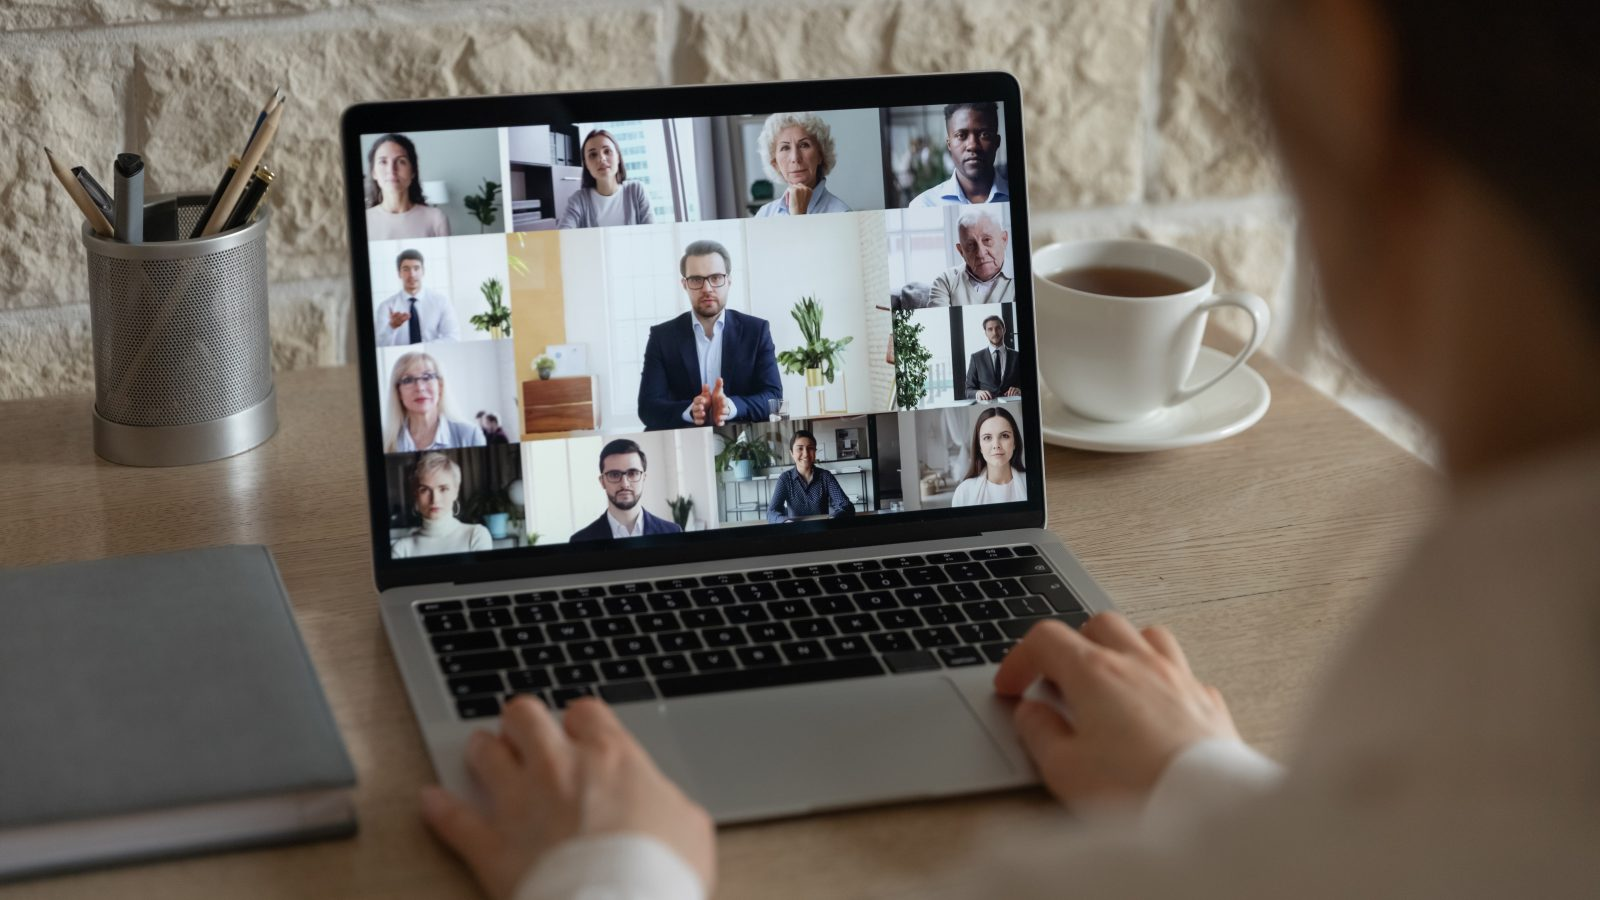 Workplace Wellness zoom meeting